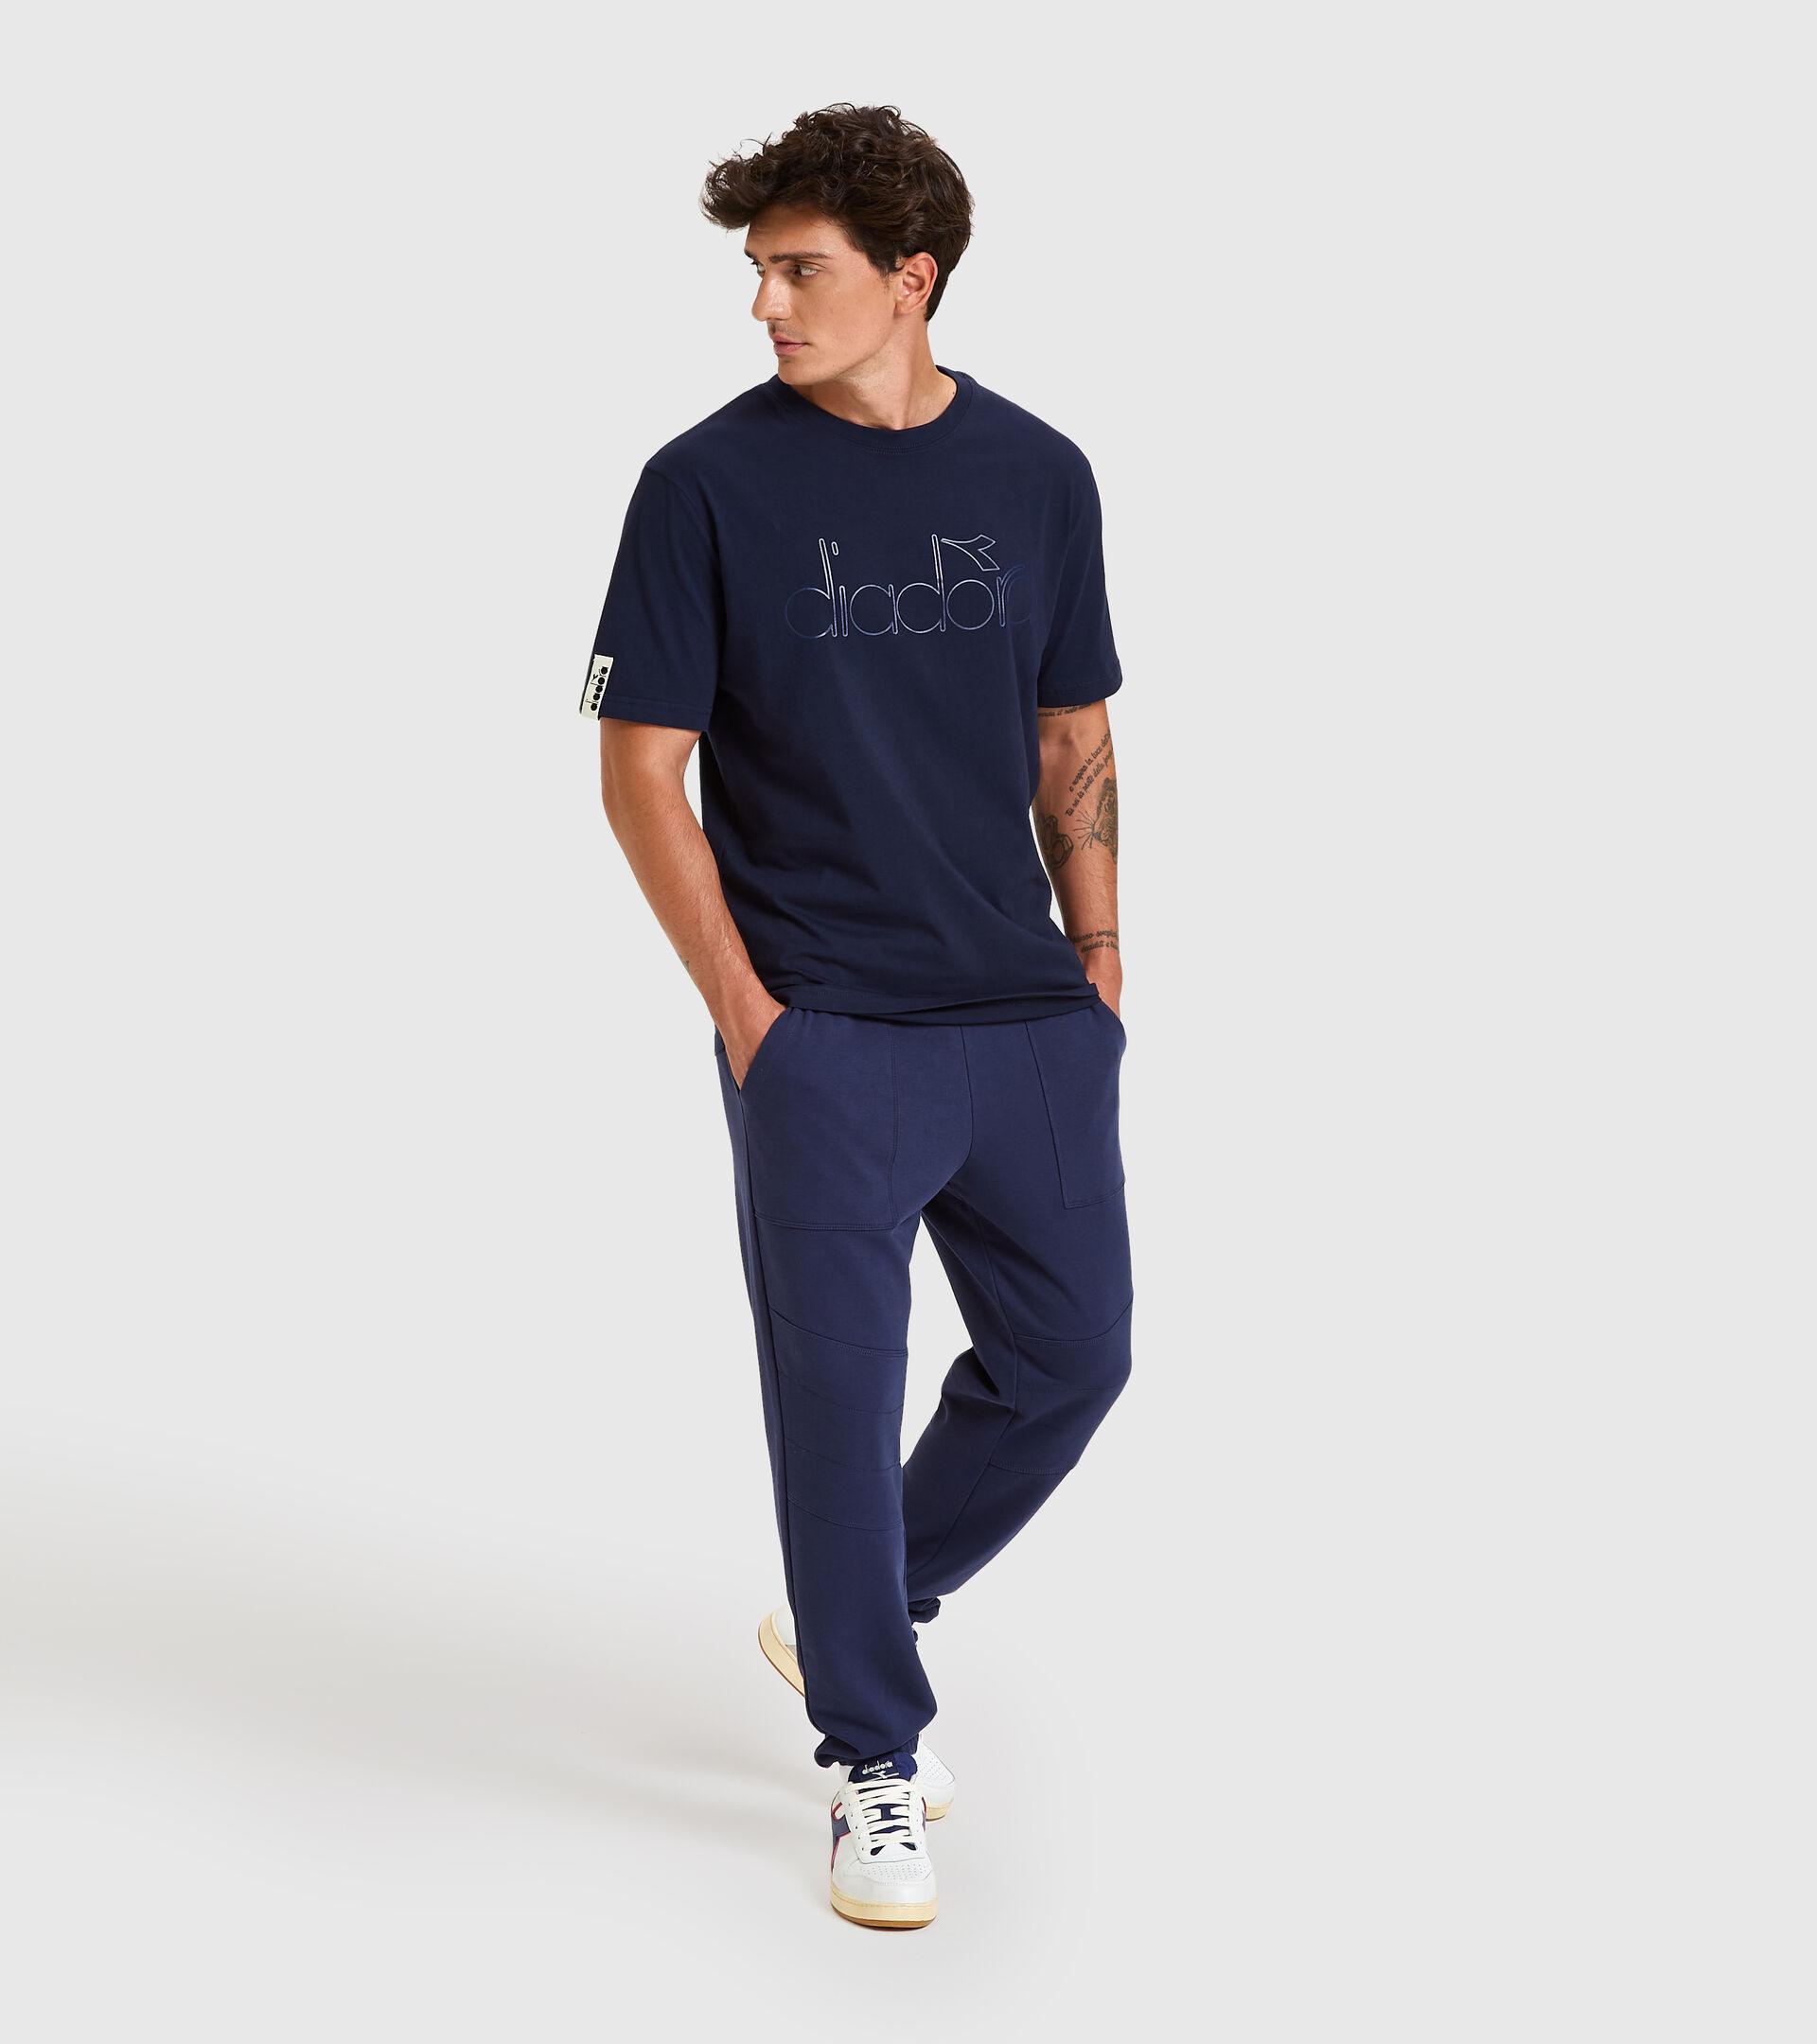 T-shirt - Unisex T-SHIRT SS DIADORA HD CLASSIC NAVY - Diadora